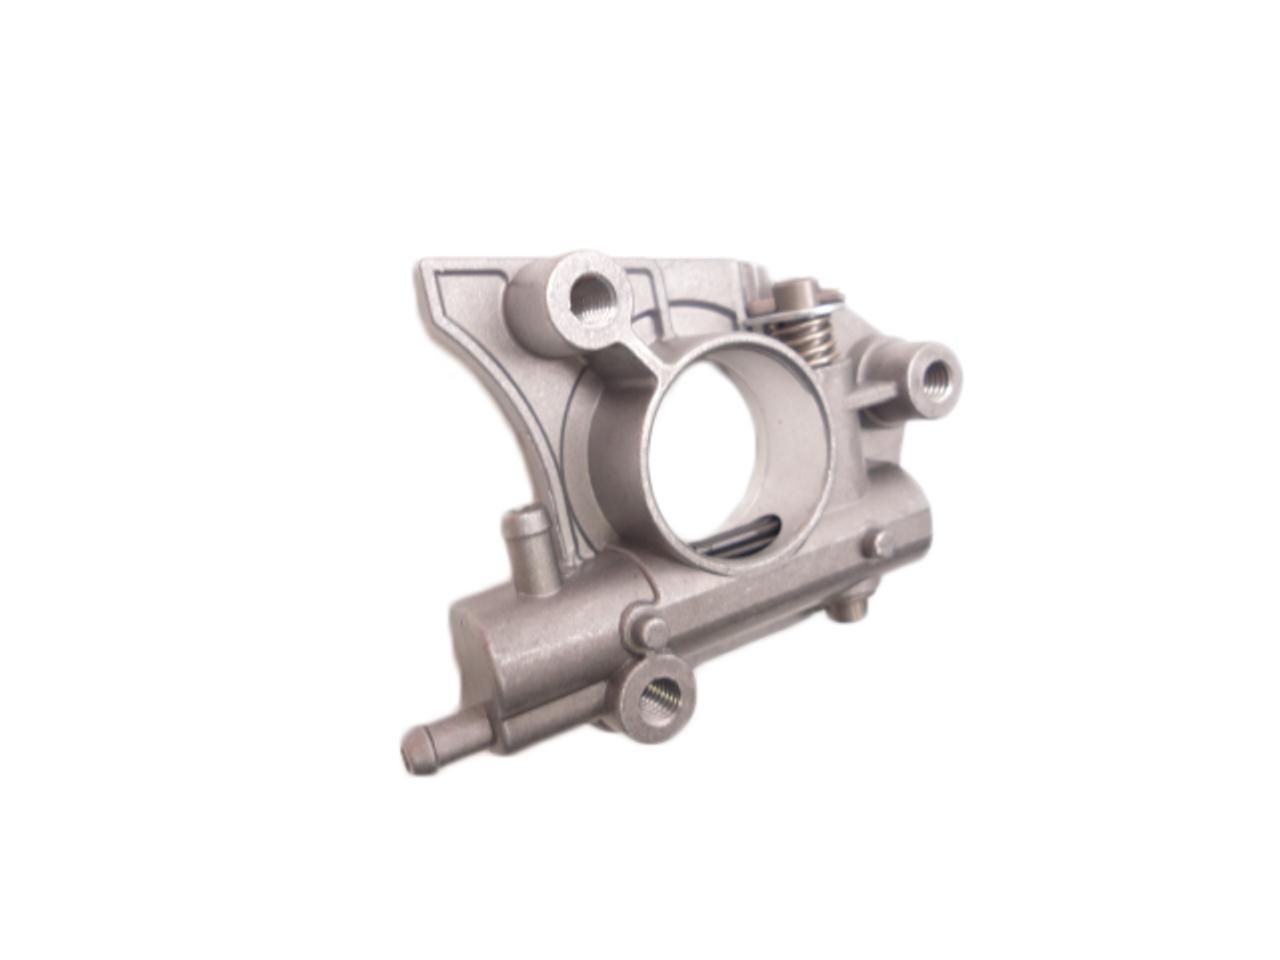 Echo Cs-440, Cs-4400, Cs-510, Cs-520, Oil Pump Assembly New Oem 43700238330 / C022000090